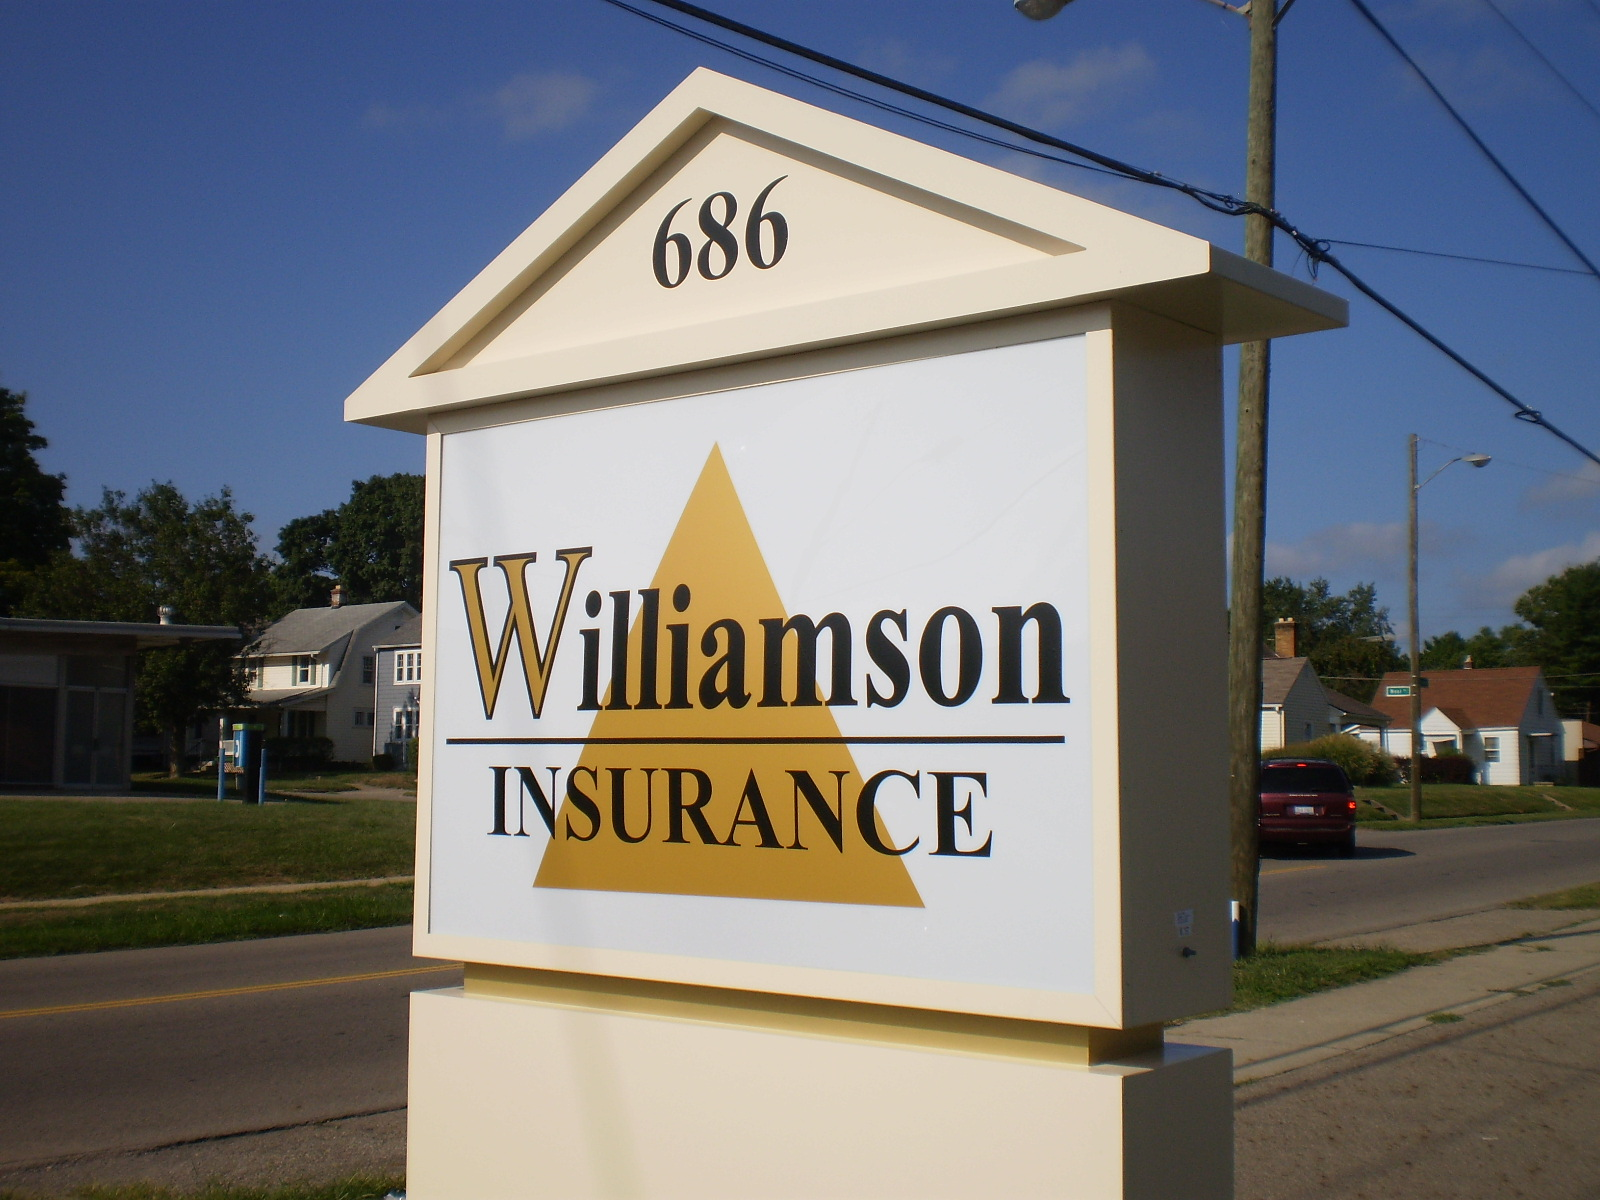 Williamson Insurance Service image 2